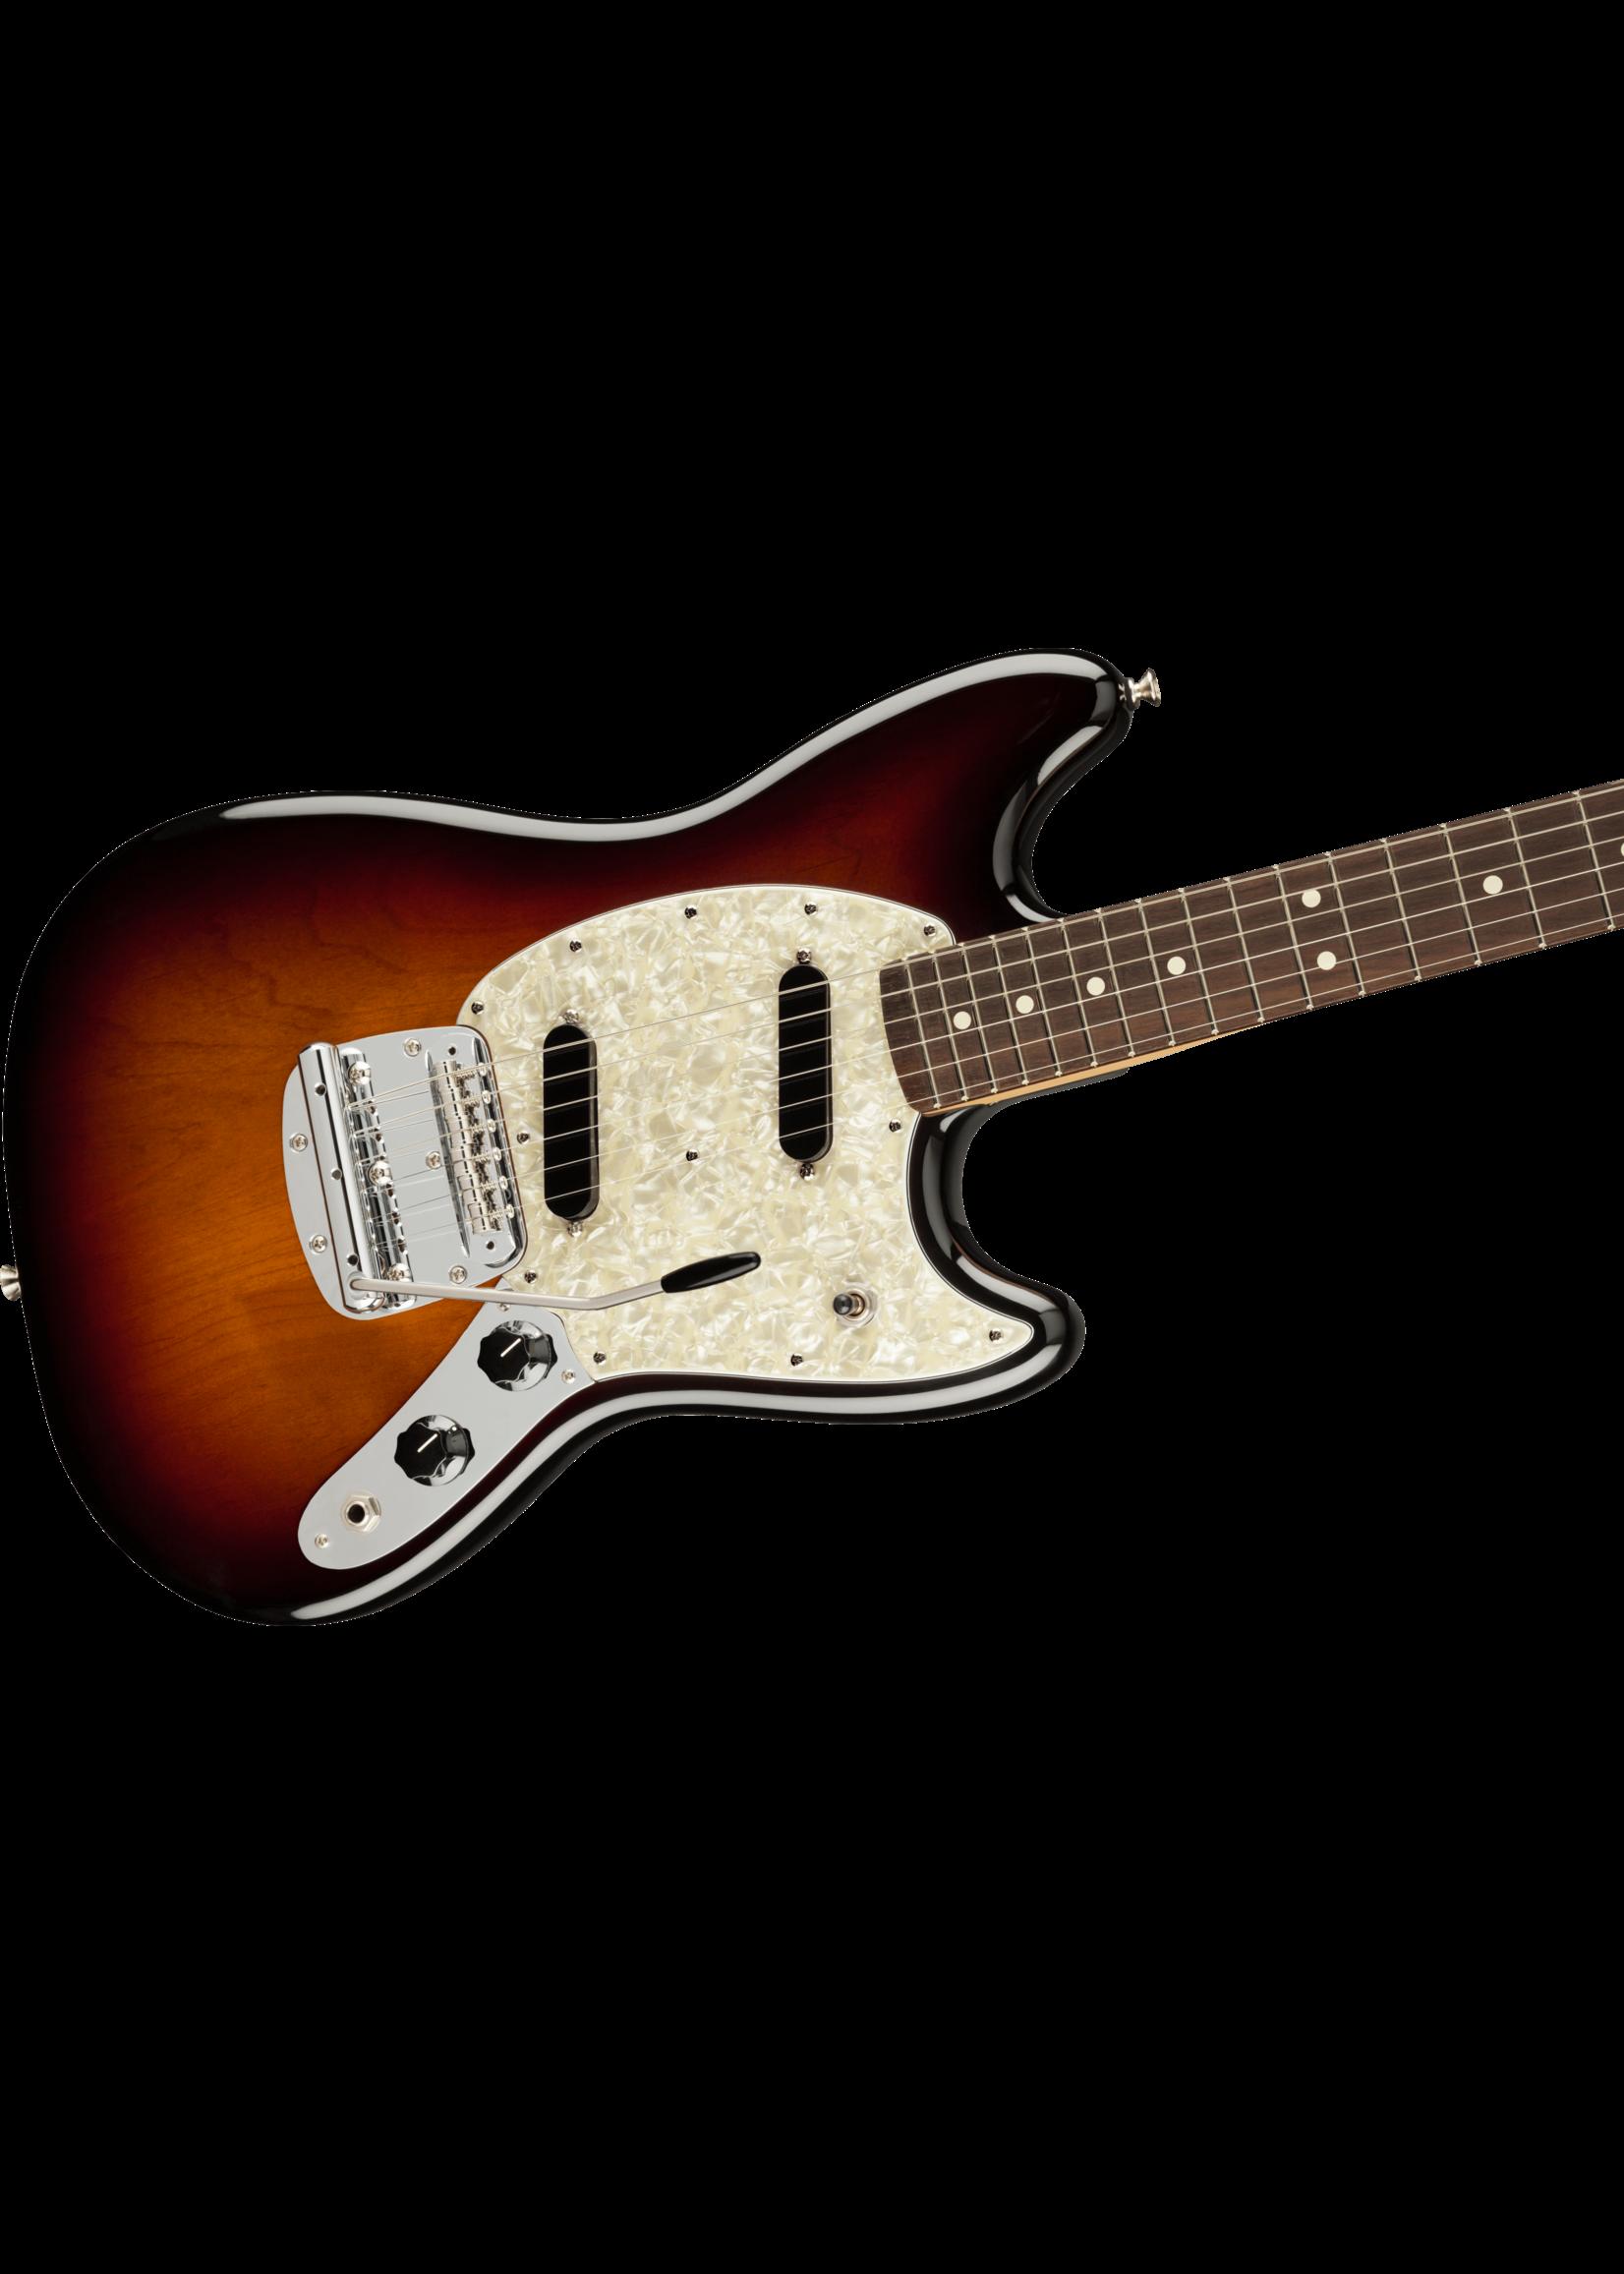 Fender Fender American Performer Mustang with Rosewood Fretboard 3-Tone Sunburst